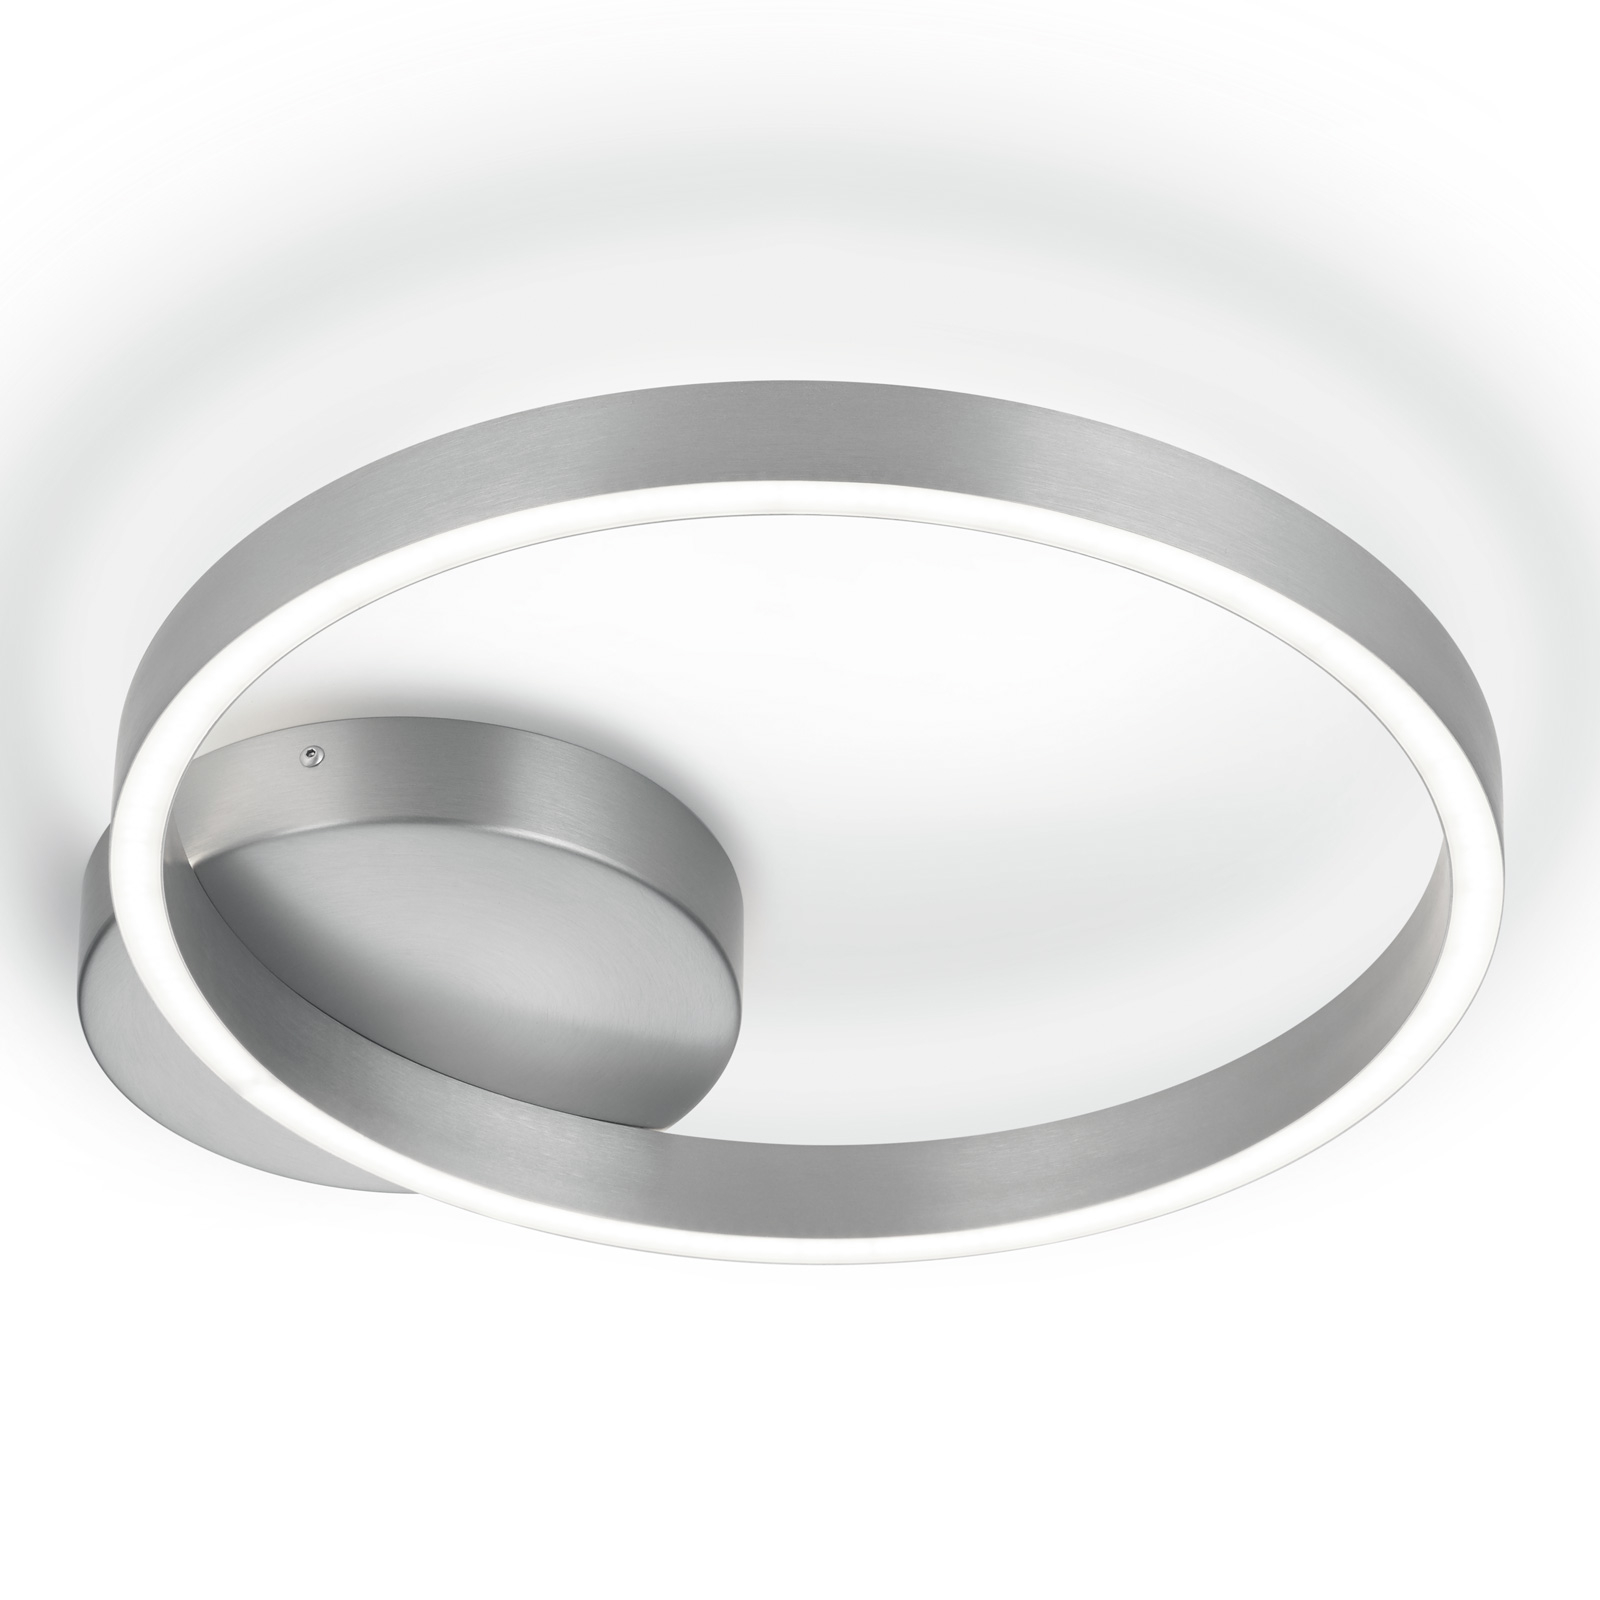 Lampa sufitowa LED Anel-40, pośrednia/bezpośrednia